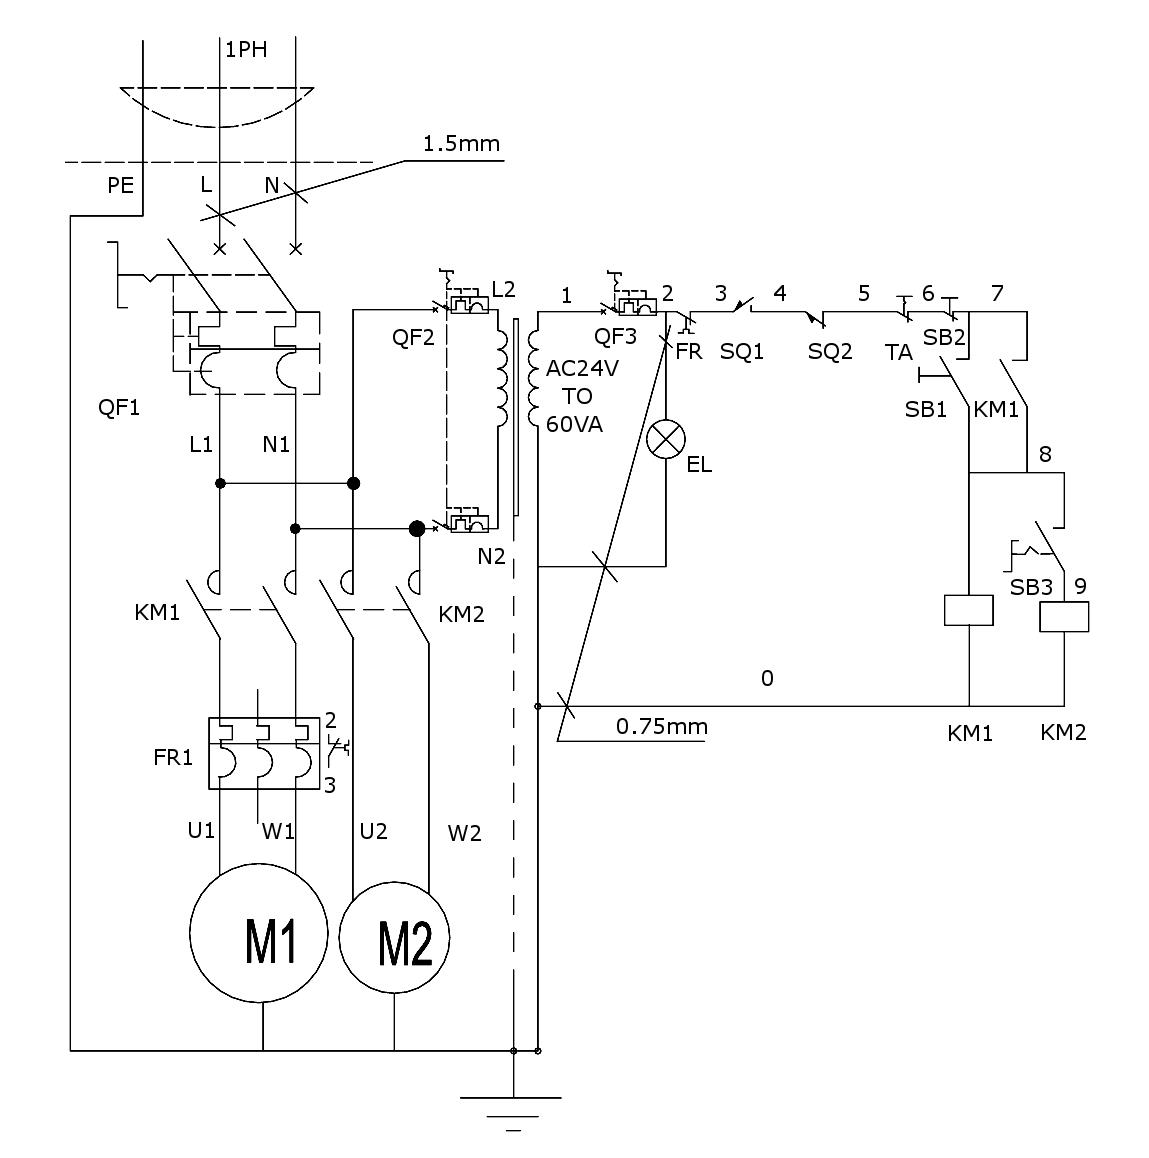 [NRIO_4796]   CM_0316] Bandsaw Wiring Diagram Free Diagram | Delta Saw 28 640 Wiring Diagram |  | Unre Marki Botse Cajos Xrenket Isra Mohammedshrine Librar Wiring 101